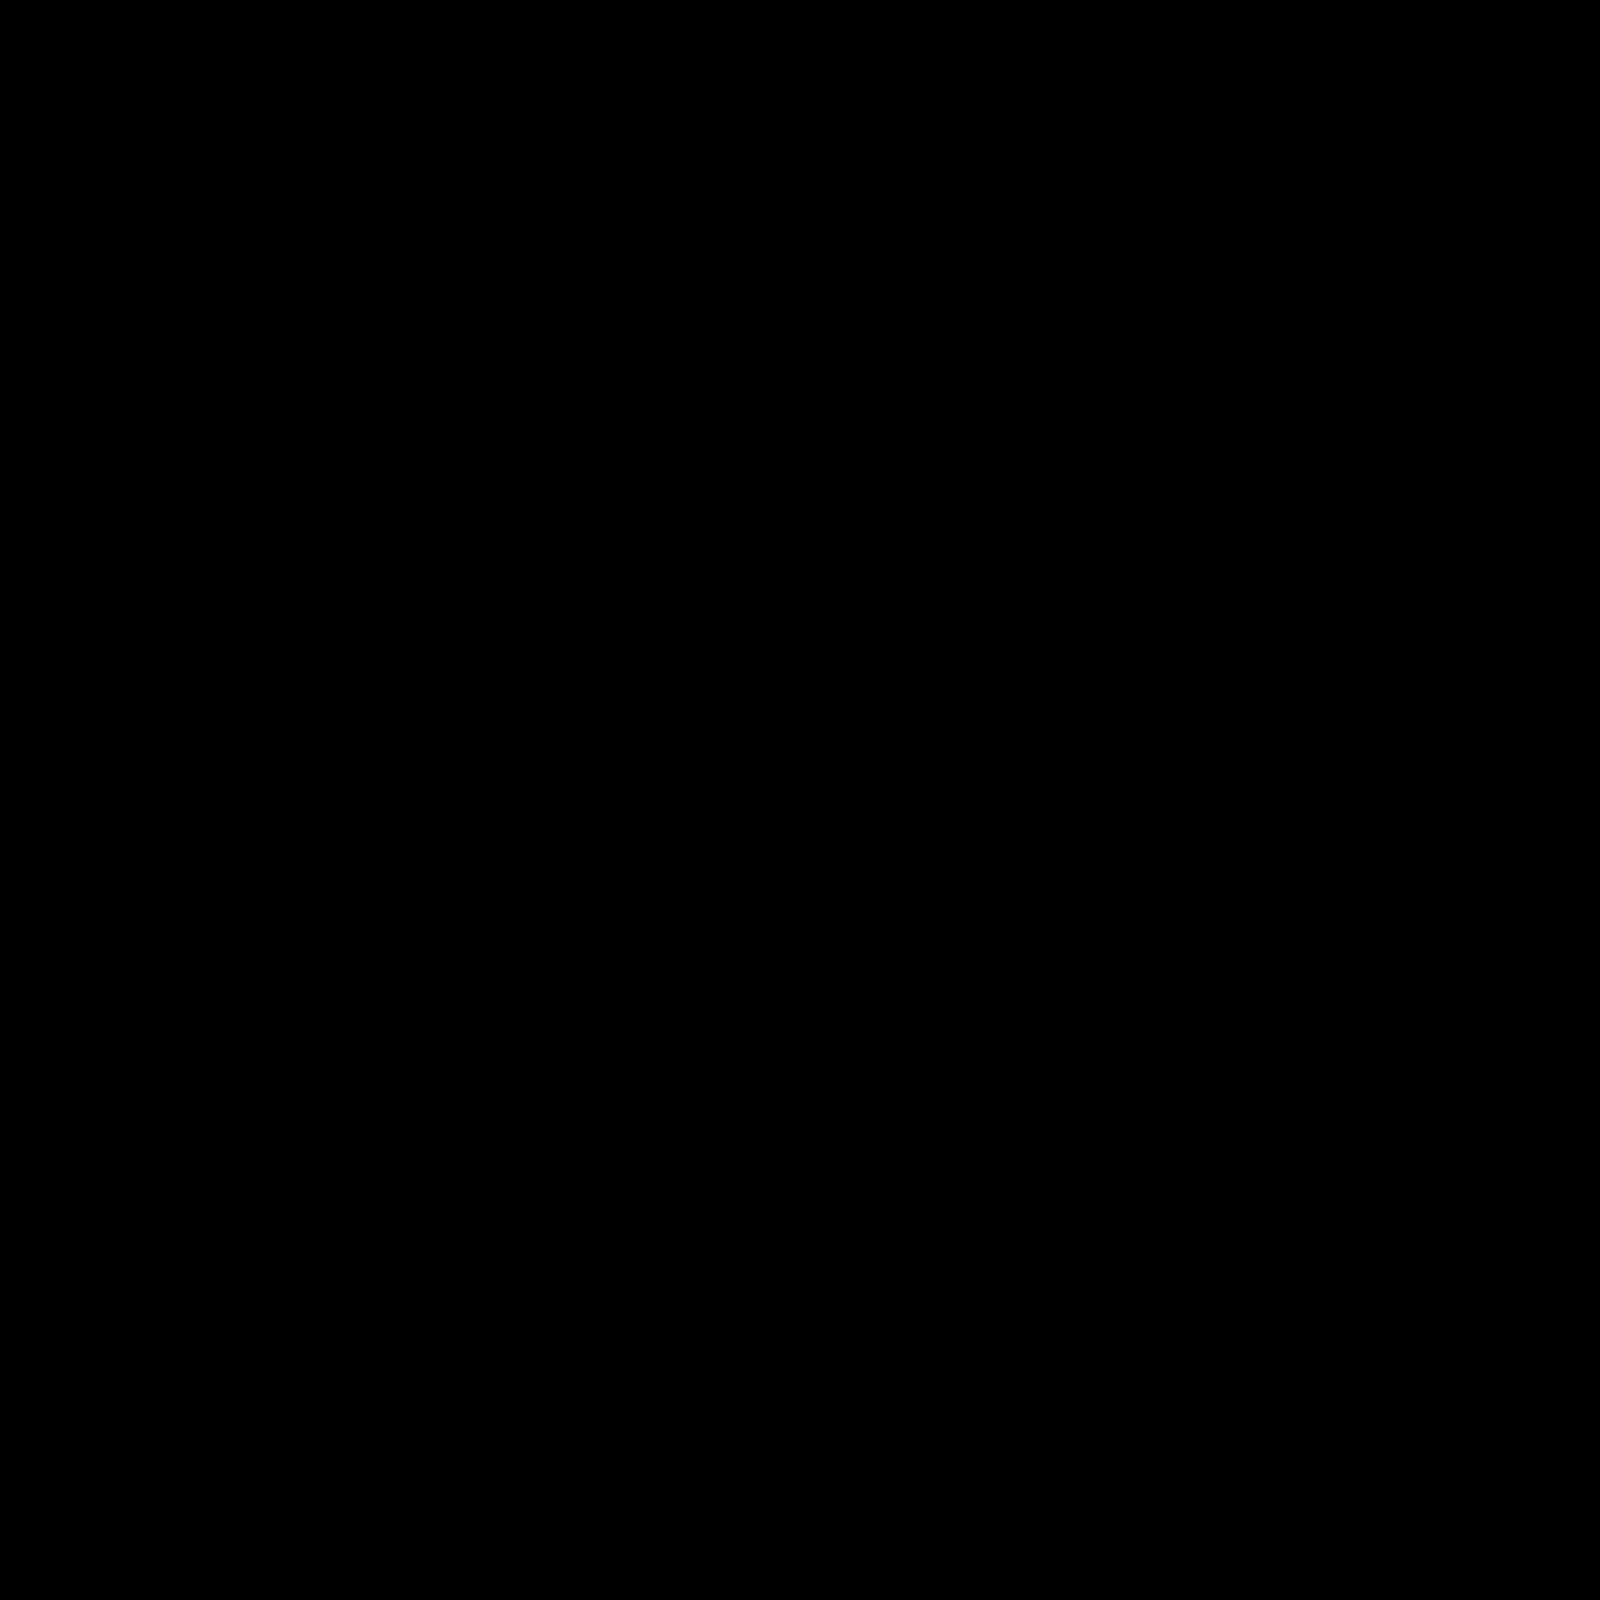 Basket-ball 2 icon